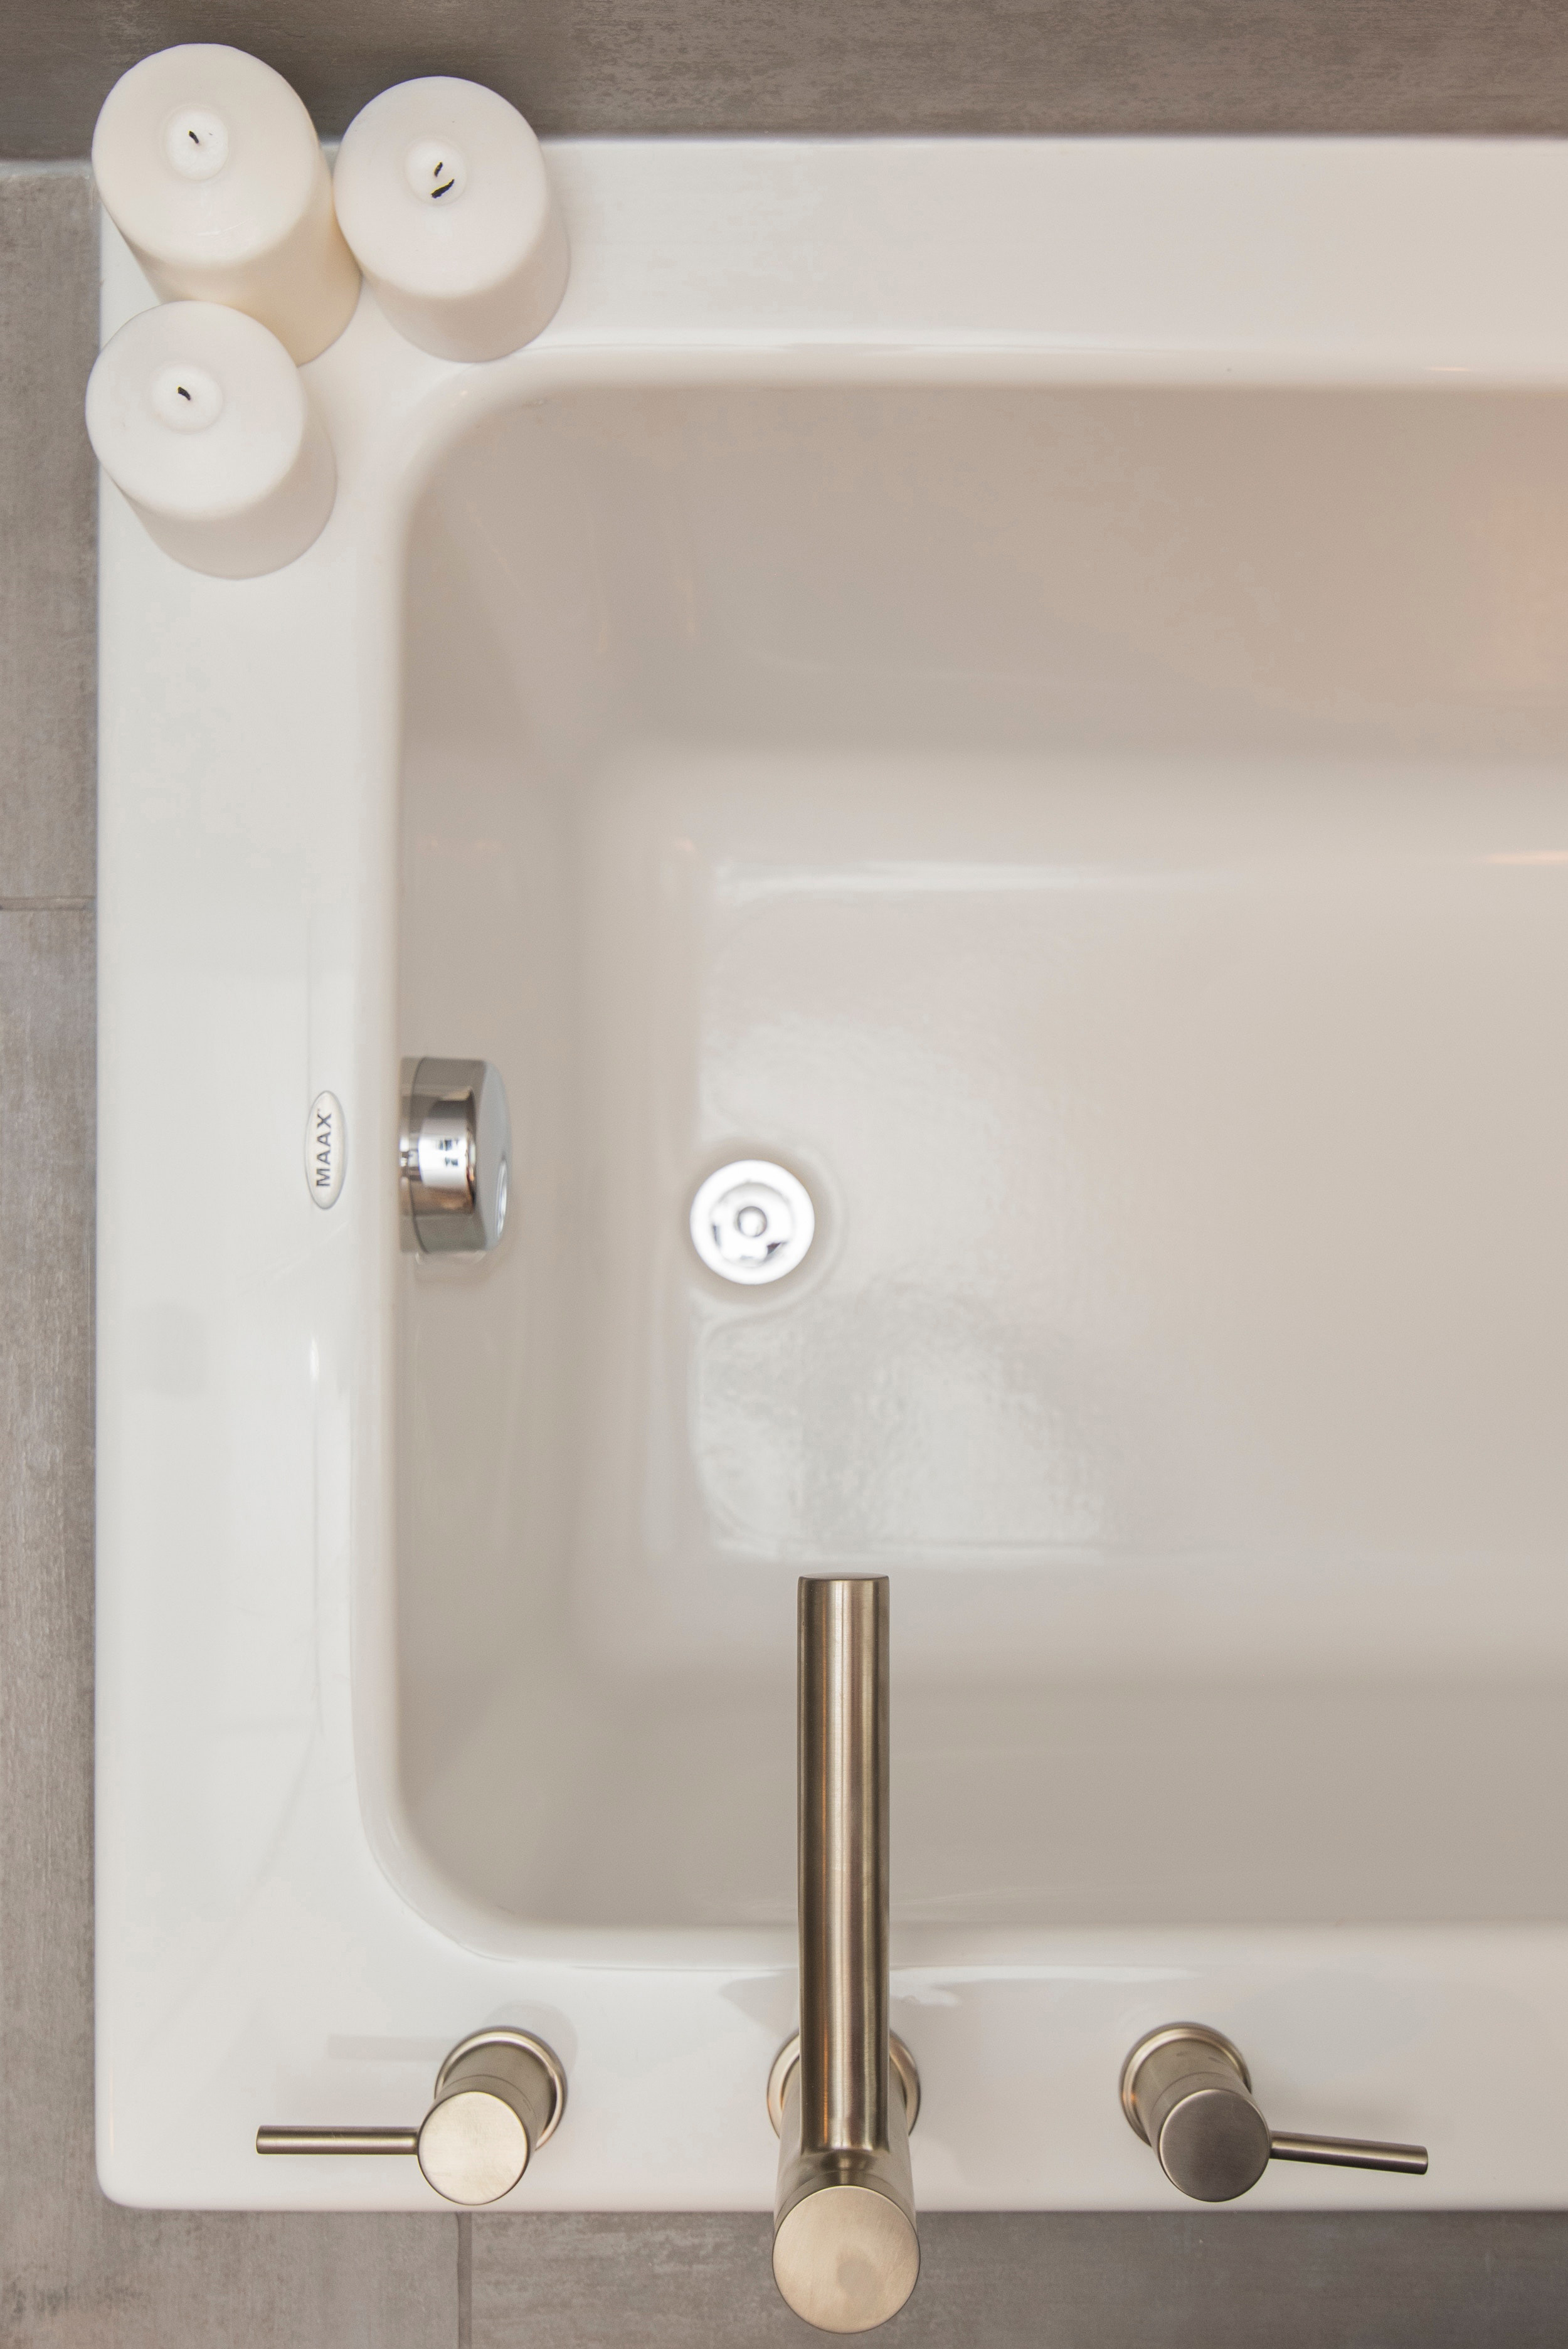 bathroom repair services st charles il